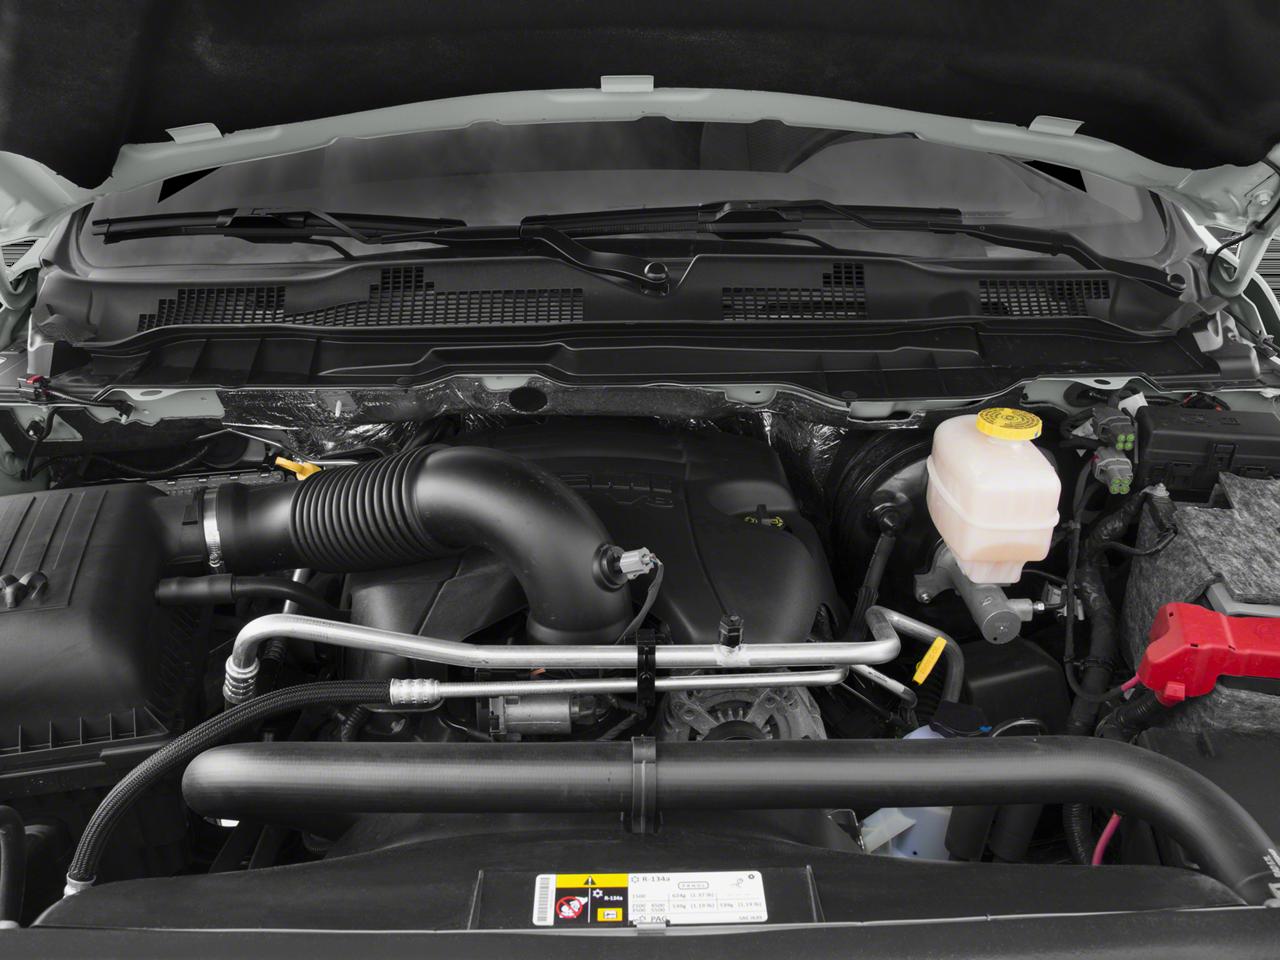 RAM 2500 engine